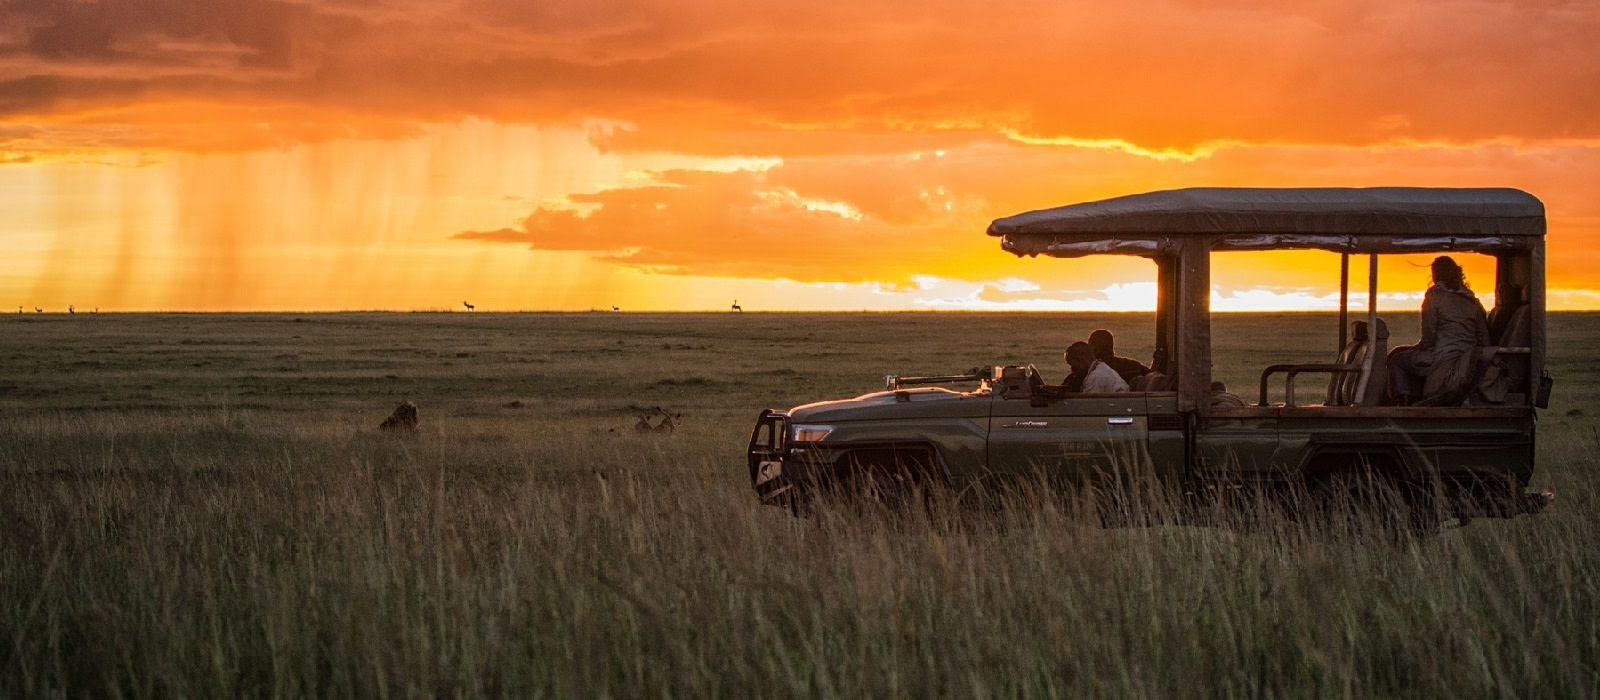 Enchanting Travels - Kenya Tours - Masai Mara - Mara Plains Camp - Sunset in the Olare Motorogi Conservancy